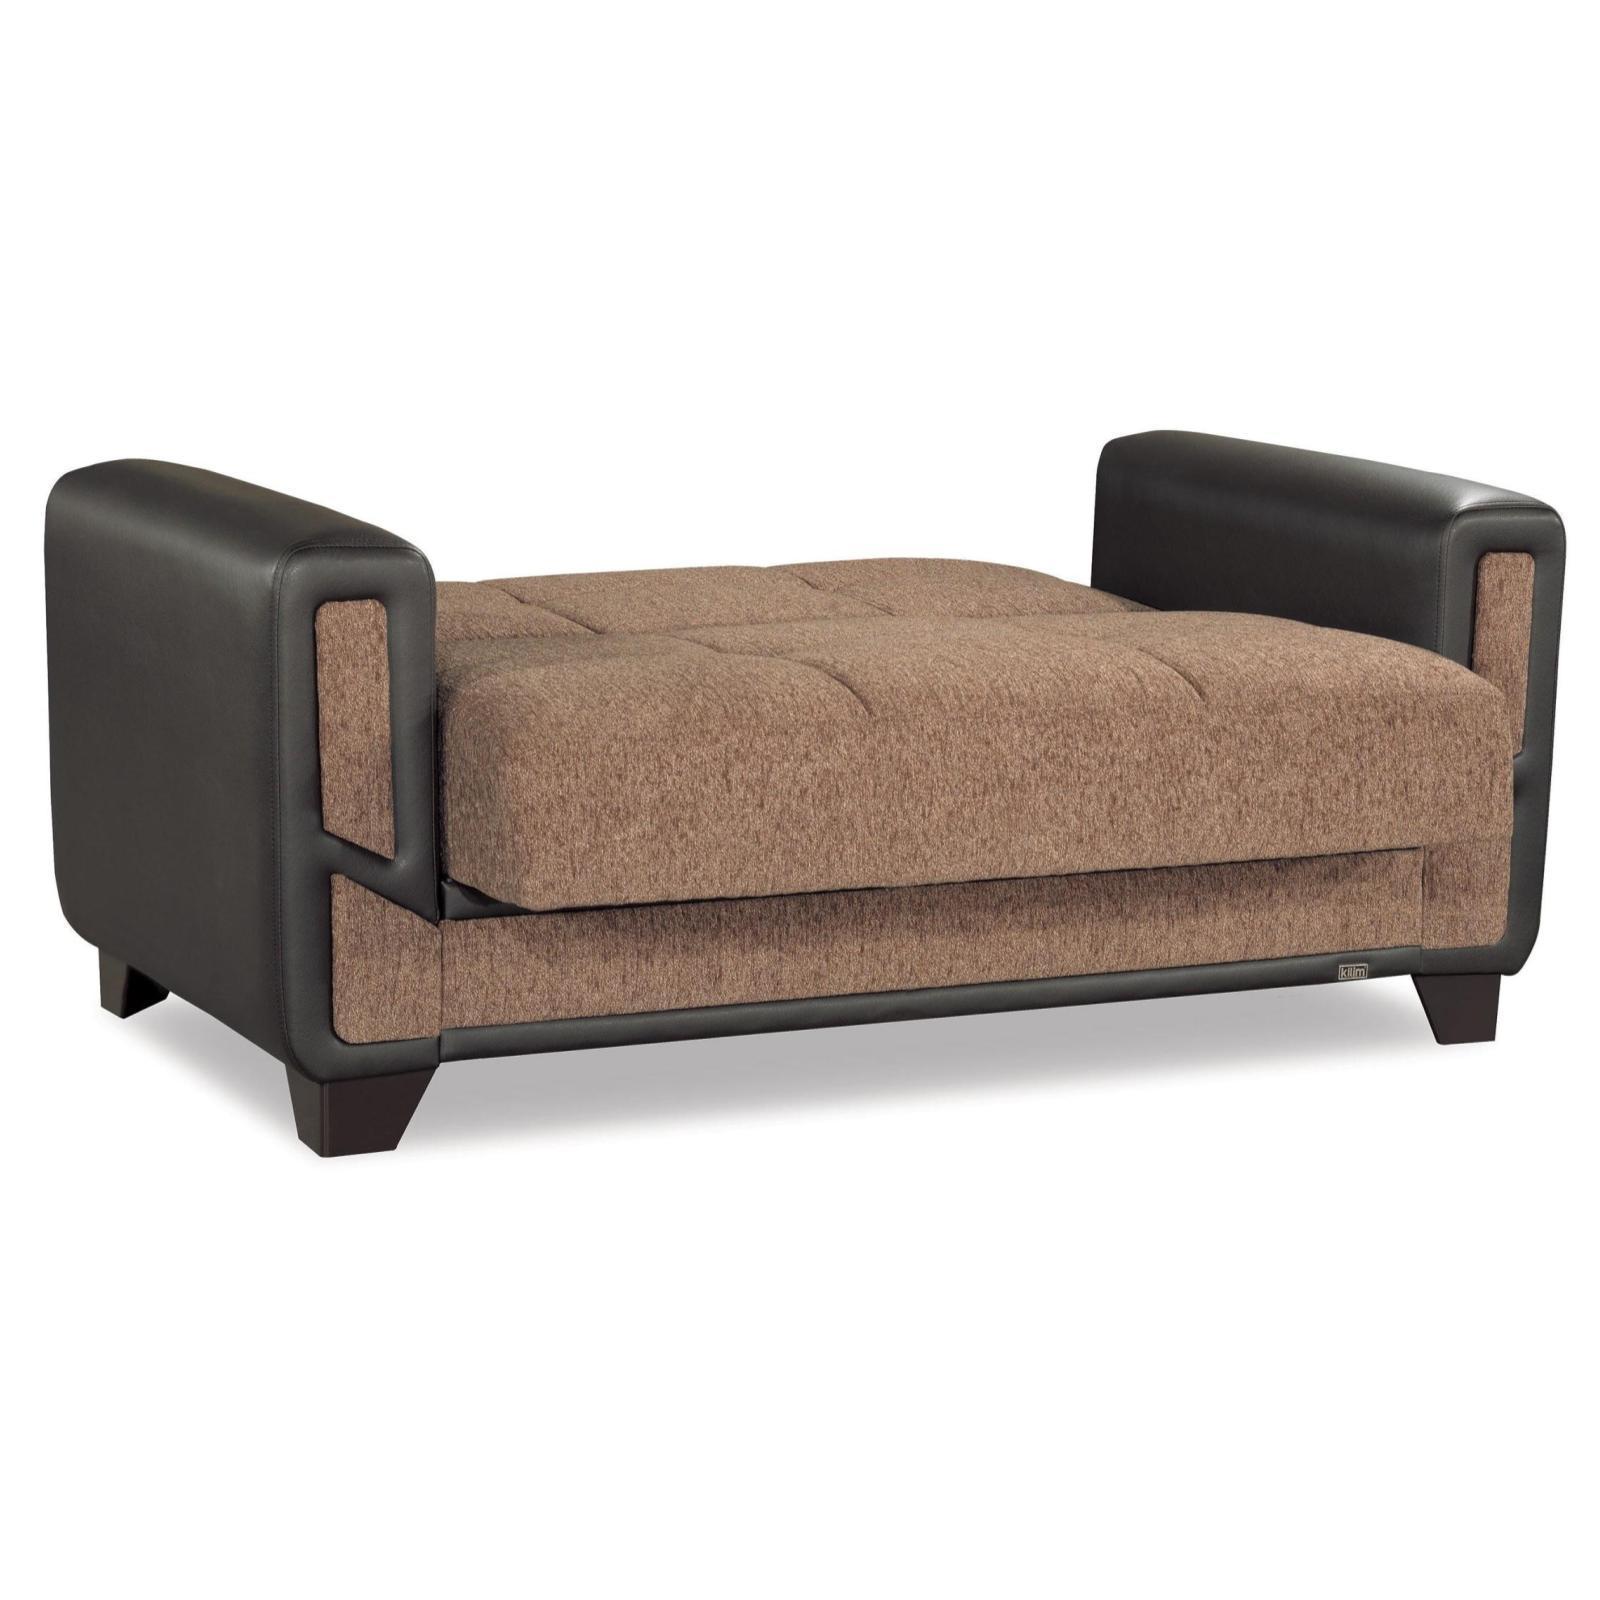 Full Size of Mondo Sofa Brown Convertible Living Room Set Adams Furniture Höffner Big Walter Knoll 3 Sitzer Grau Chesterfield Günstig Xxxl Innovation Berlin Leder Braun Sofa Mondo Sofa